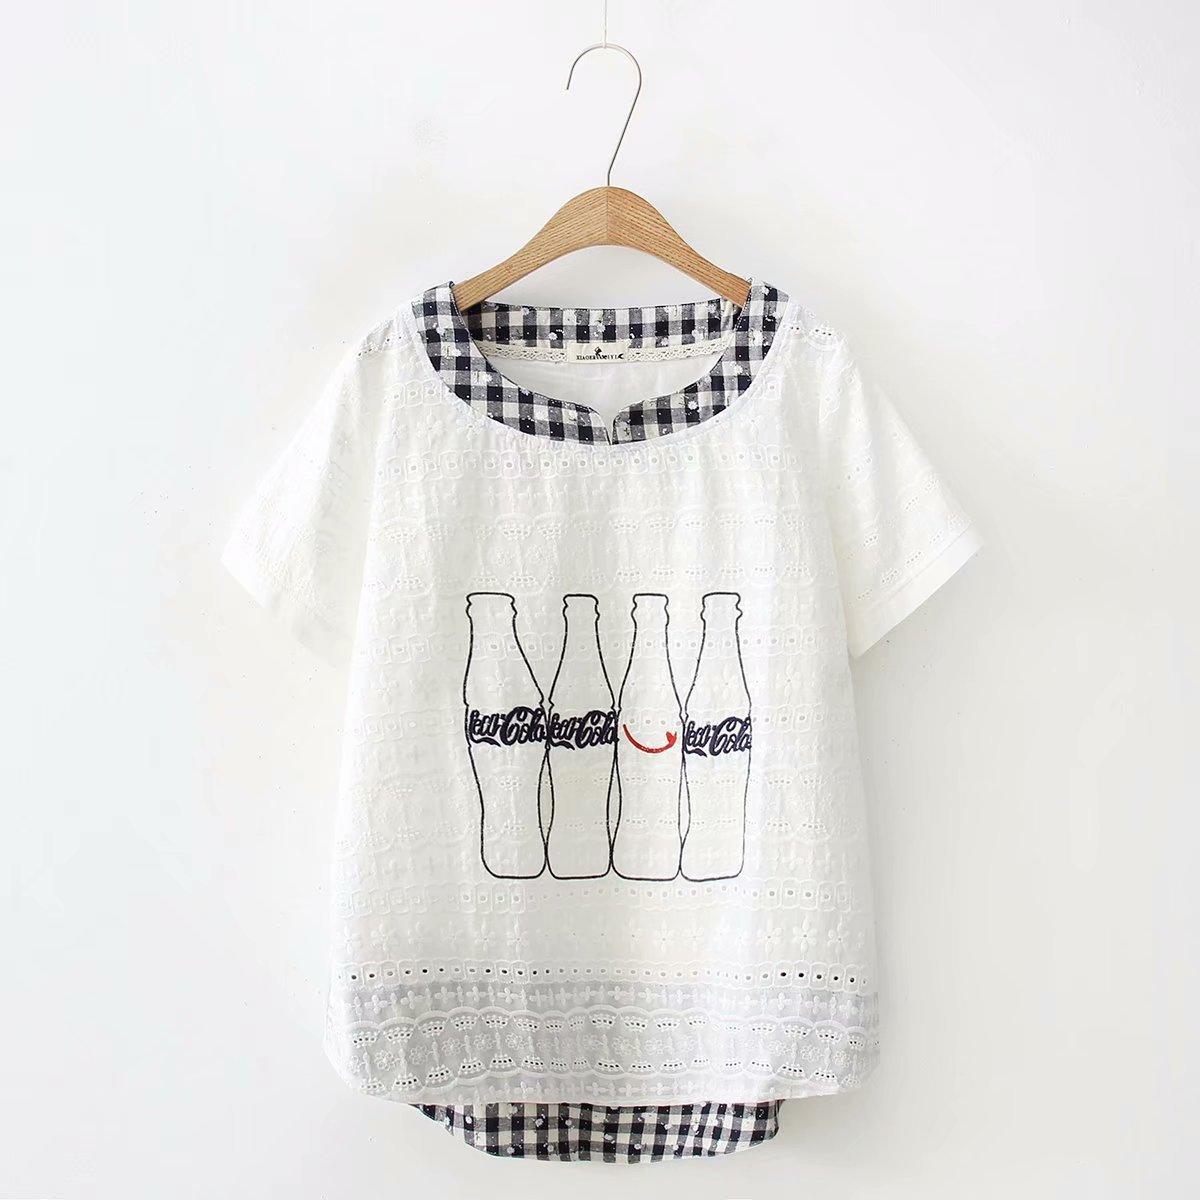 2019 impressão feminina tshirt algodão casual t camisa para senhora menina t camisa feminina